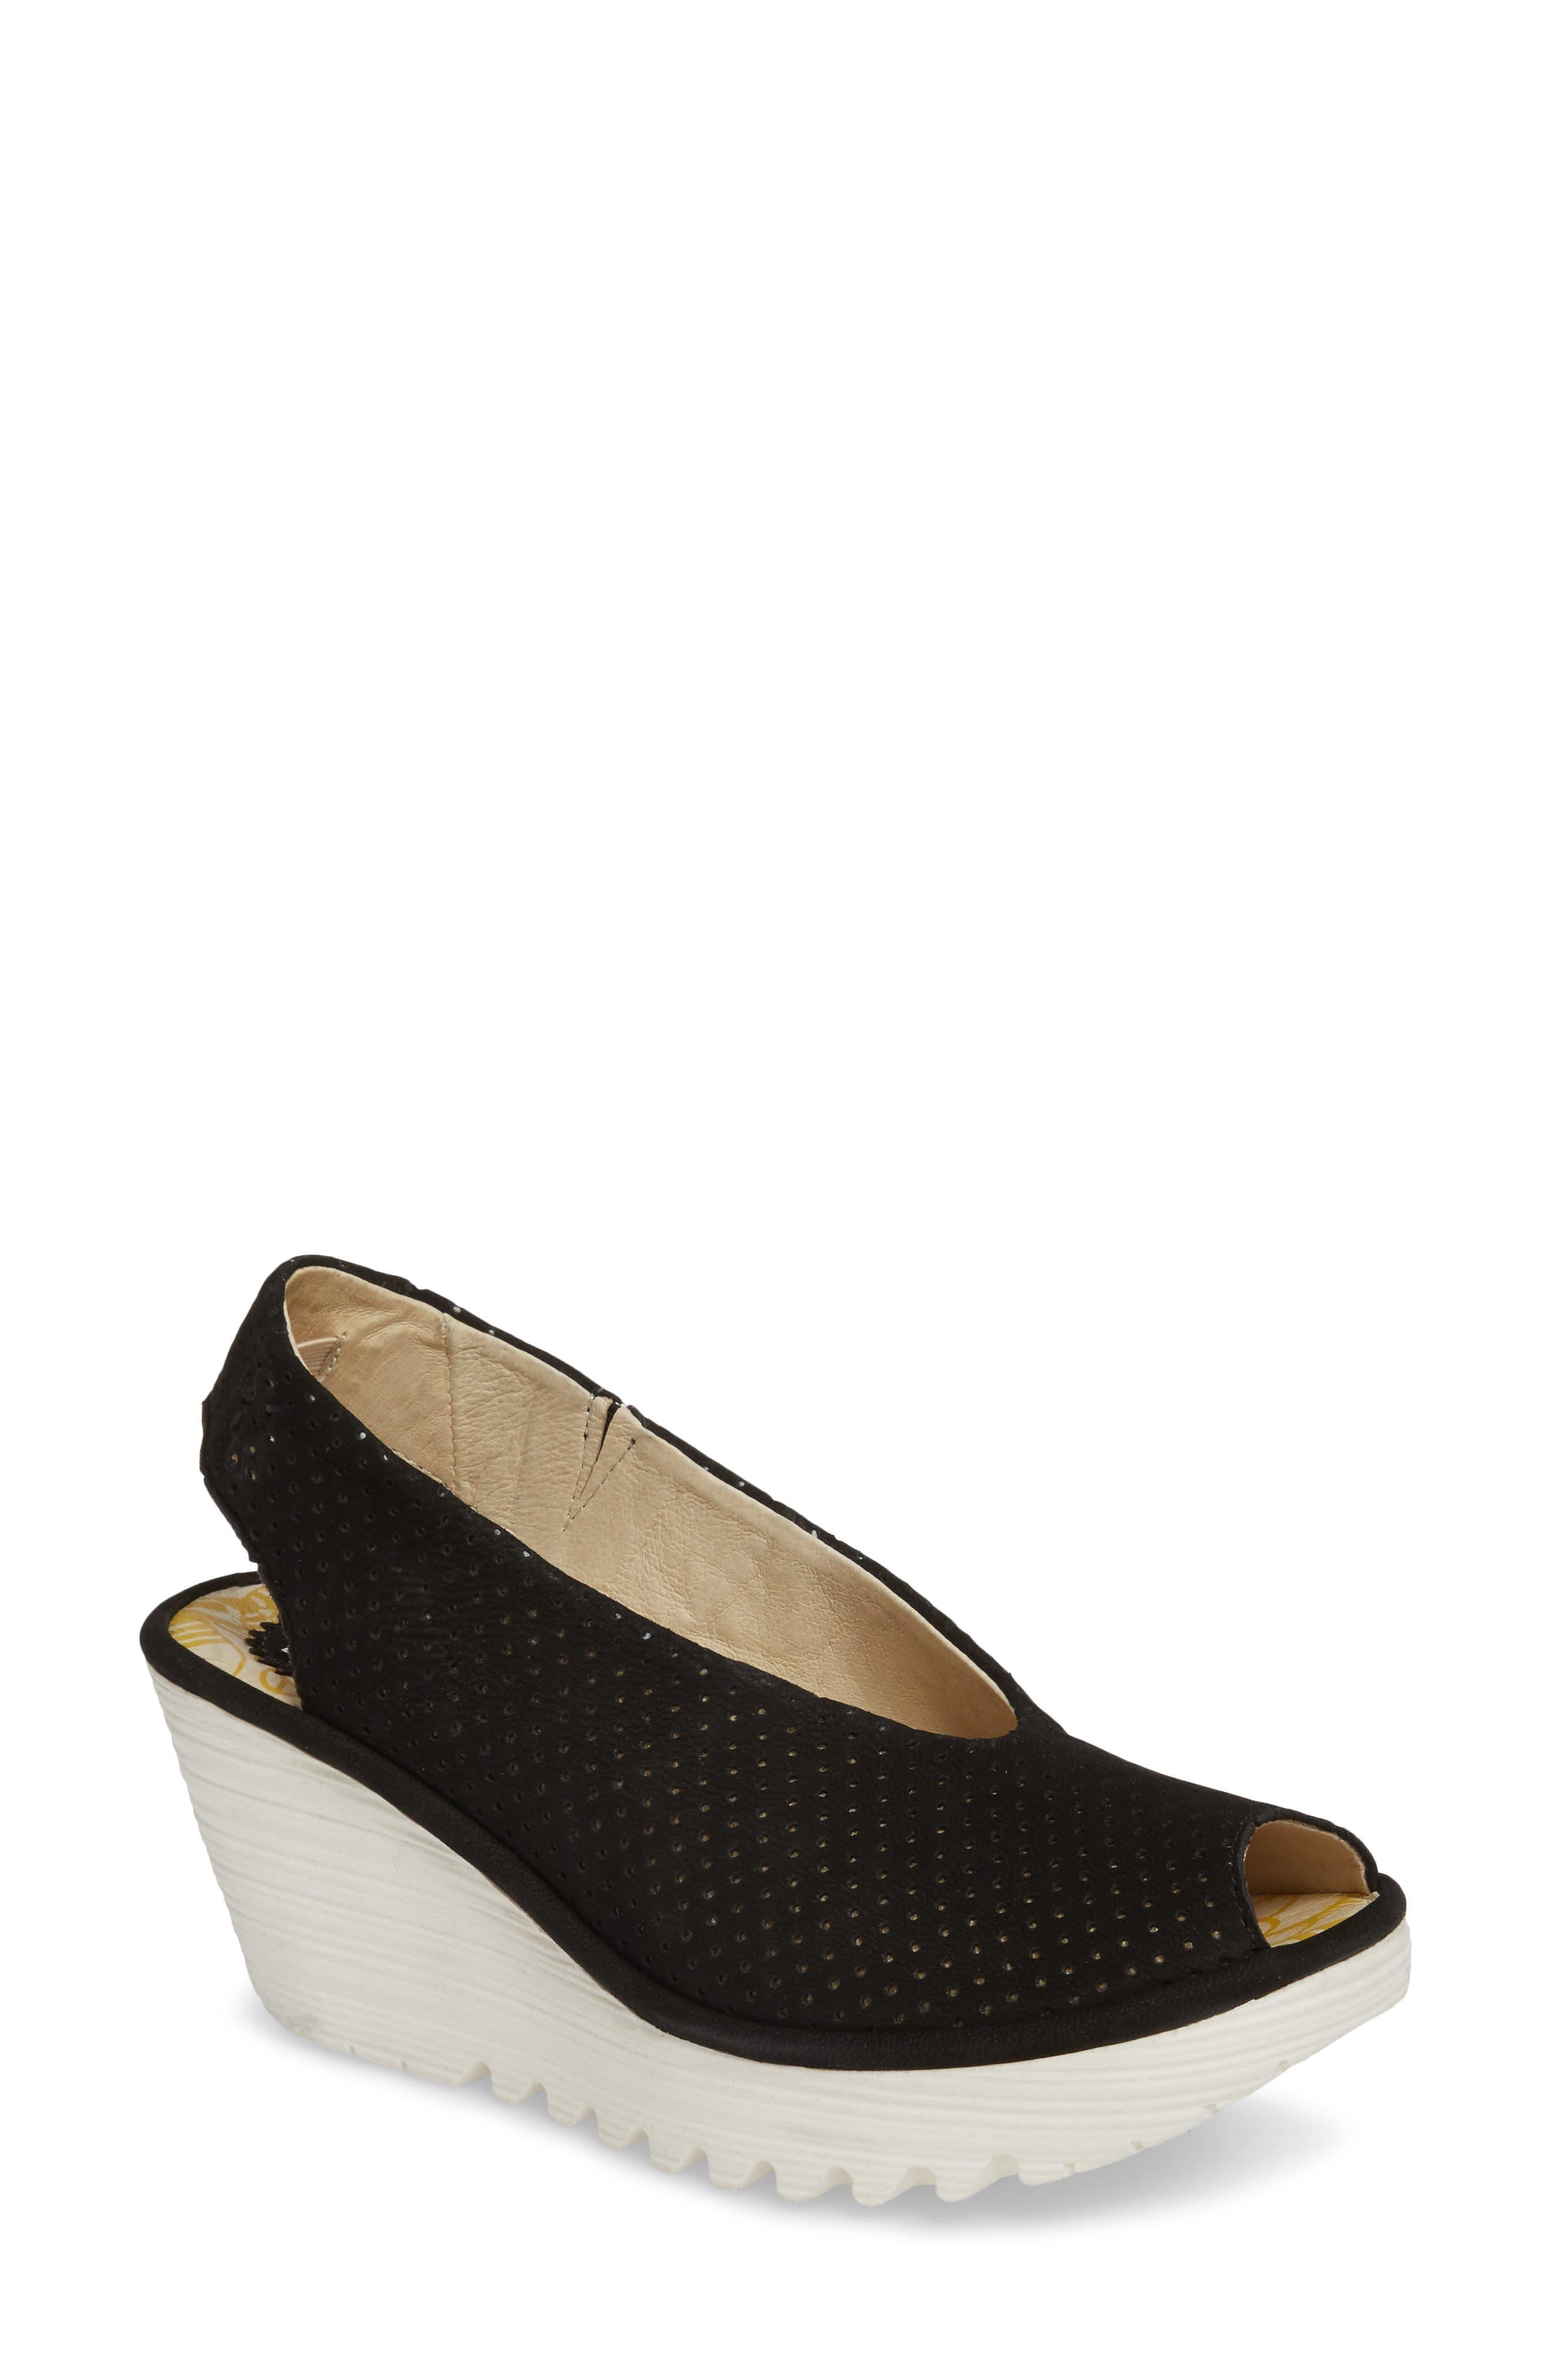 Fly London Yazu Wedge Sandal - Black